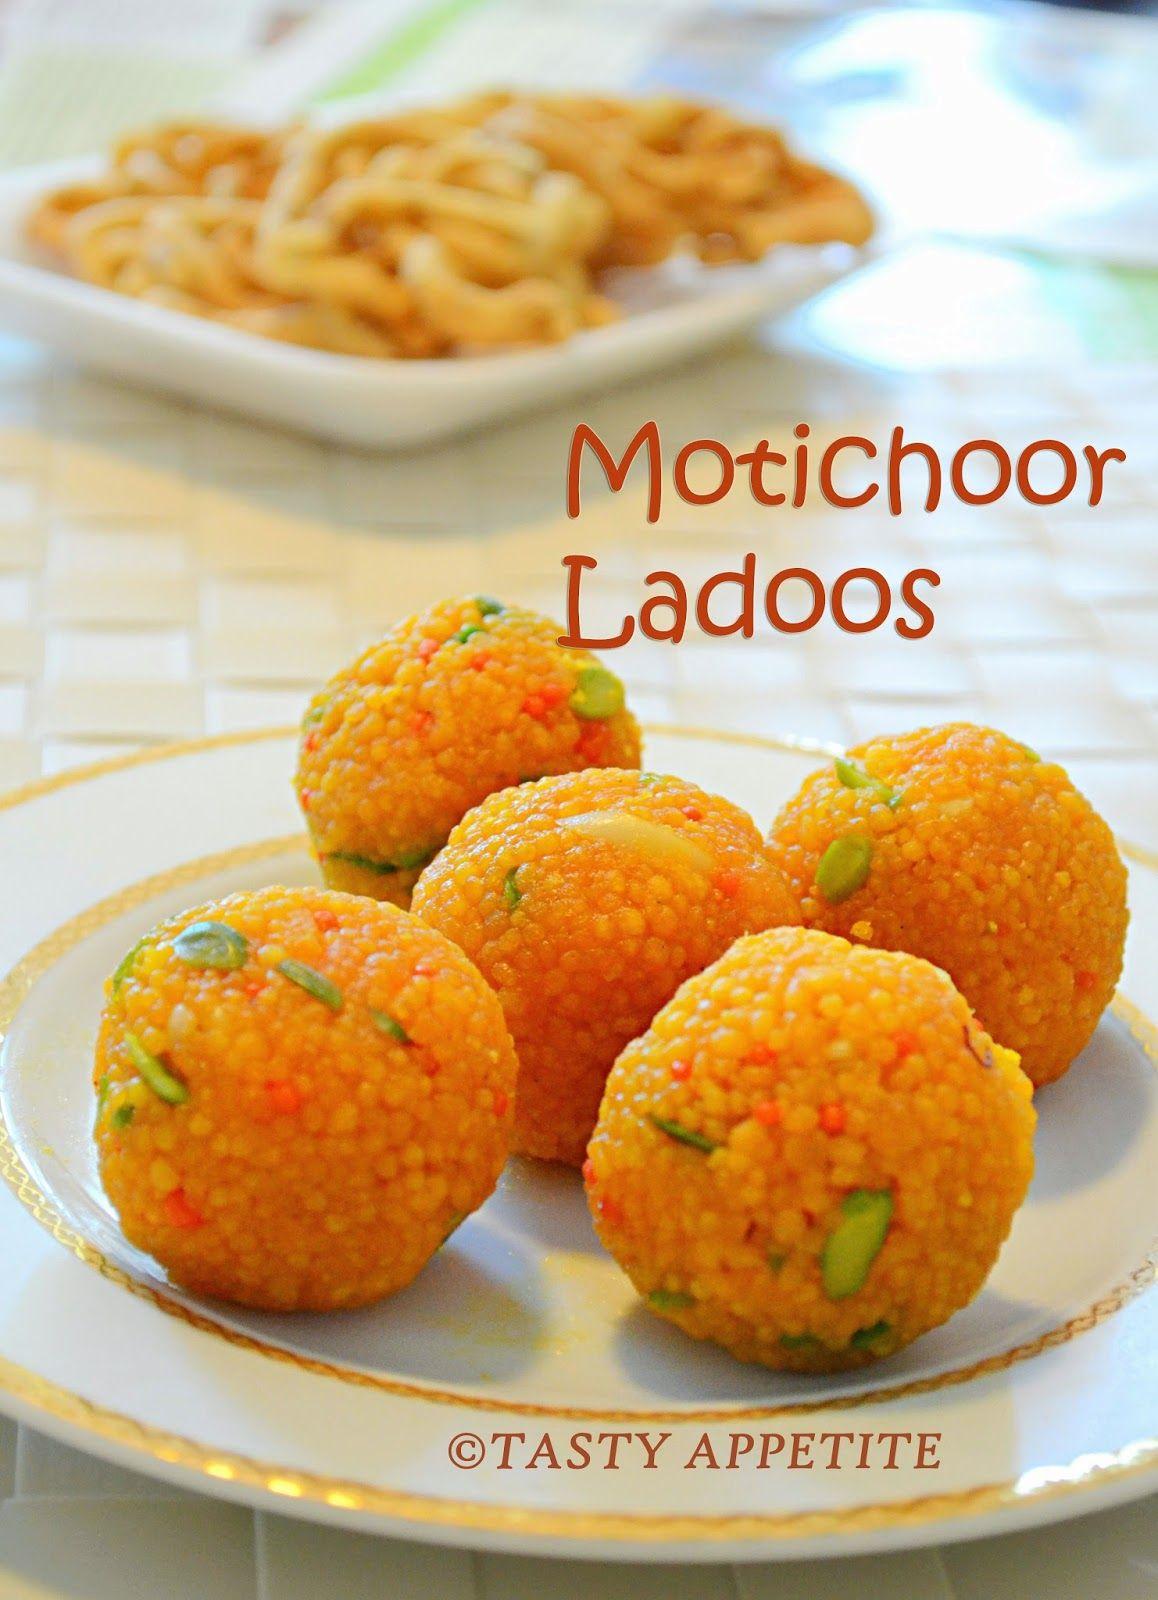 motichoor ladoo how to make motichoor ladoo easy diwali sweets recipemotichoor ladoomotichur ladduladoo recipesjeyashris kitchen rec - Jeyashris Kitchen